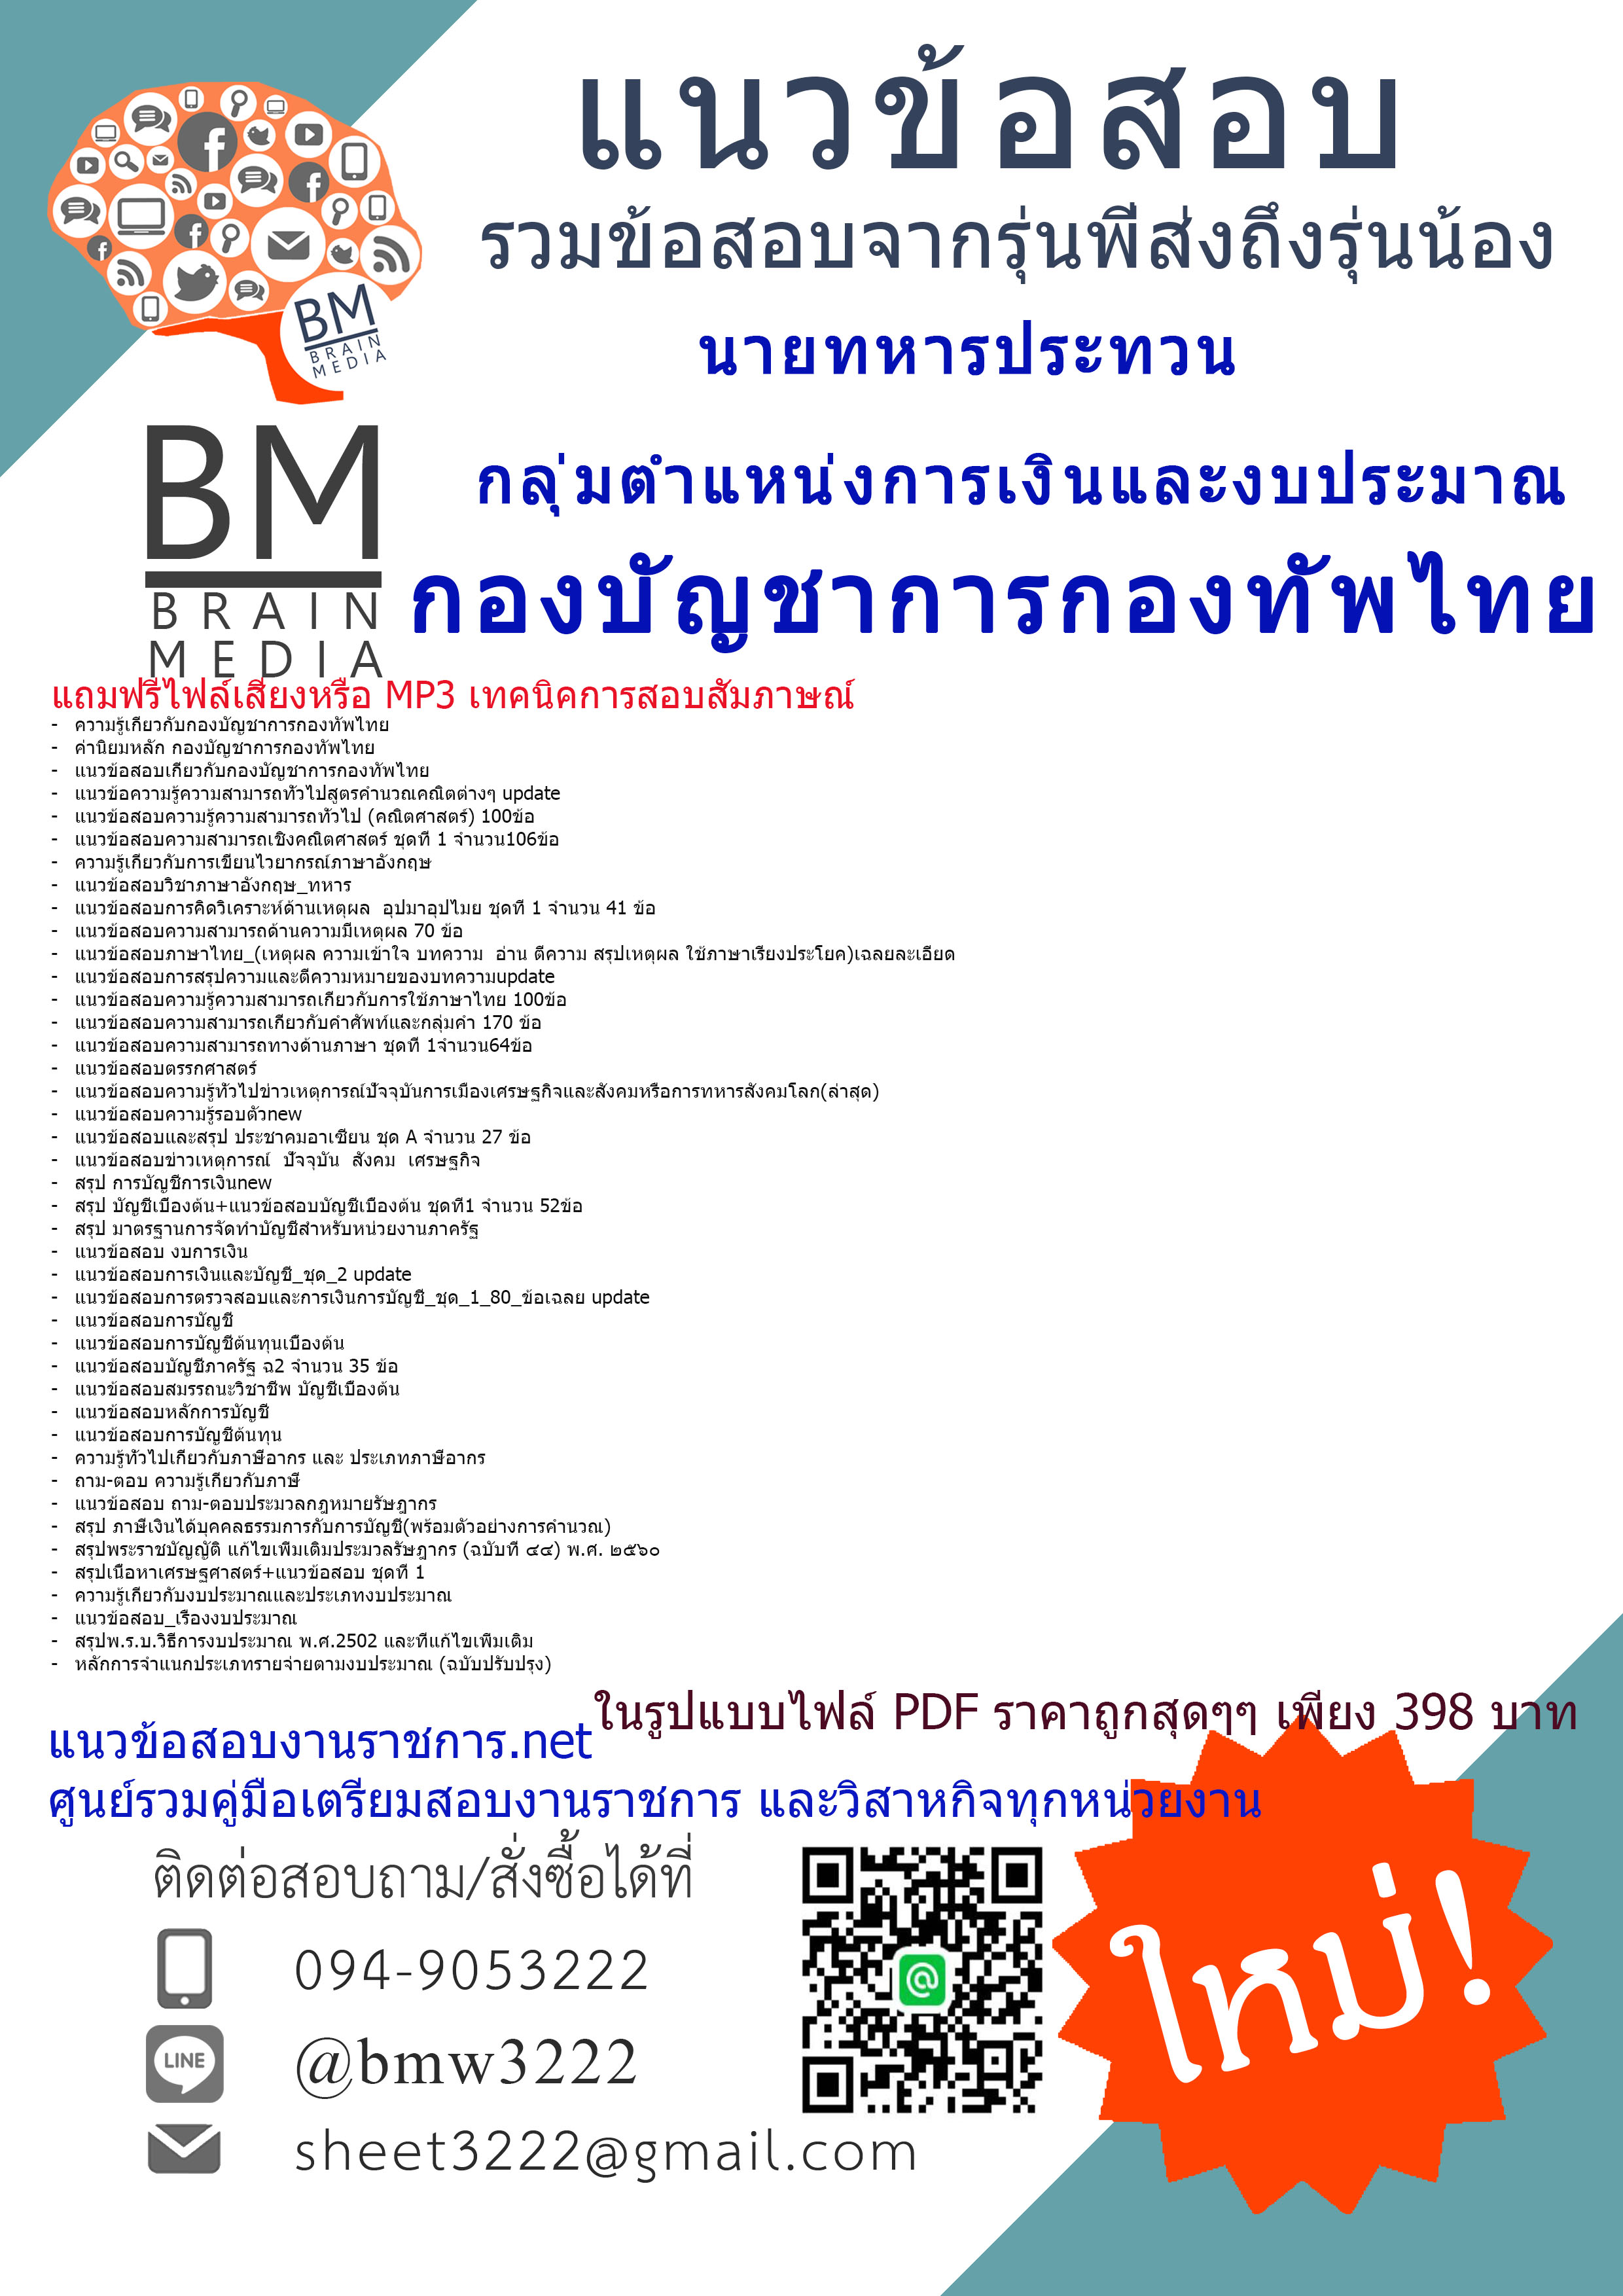 (((newupdateสุด)))แนวข้อสอบนายทหารประทวนกลุ่มตำแหน่งการเงินและงบประมาณกองบัญชาการกองทัพไทย